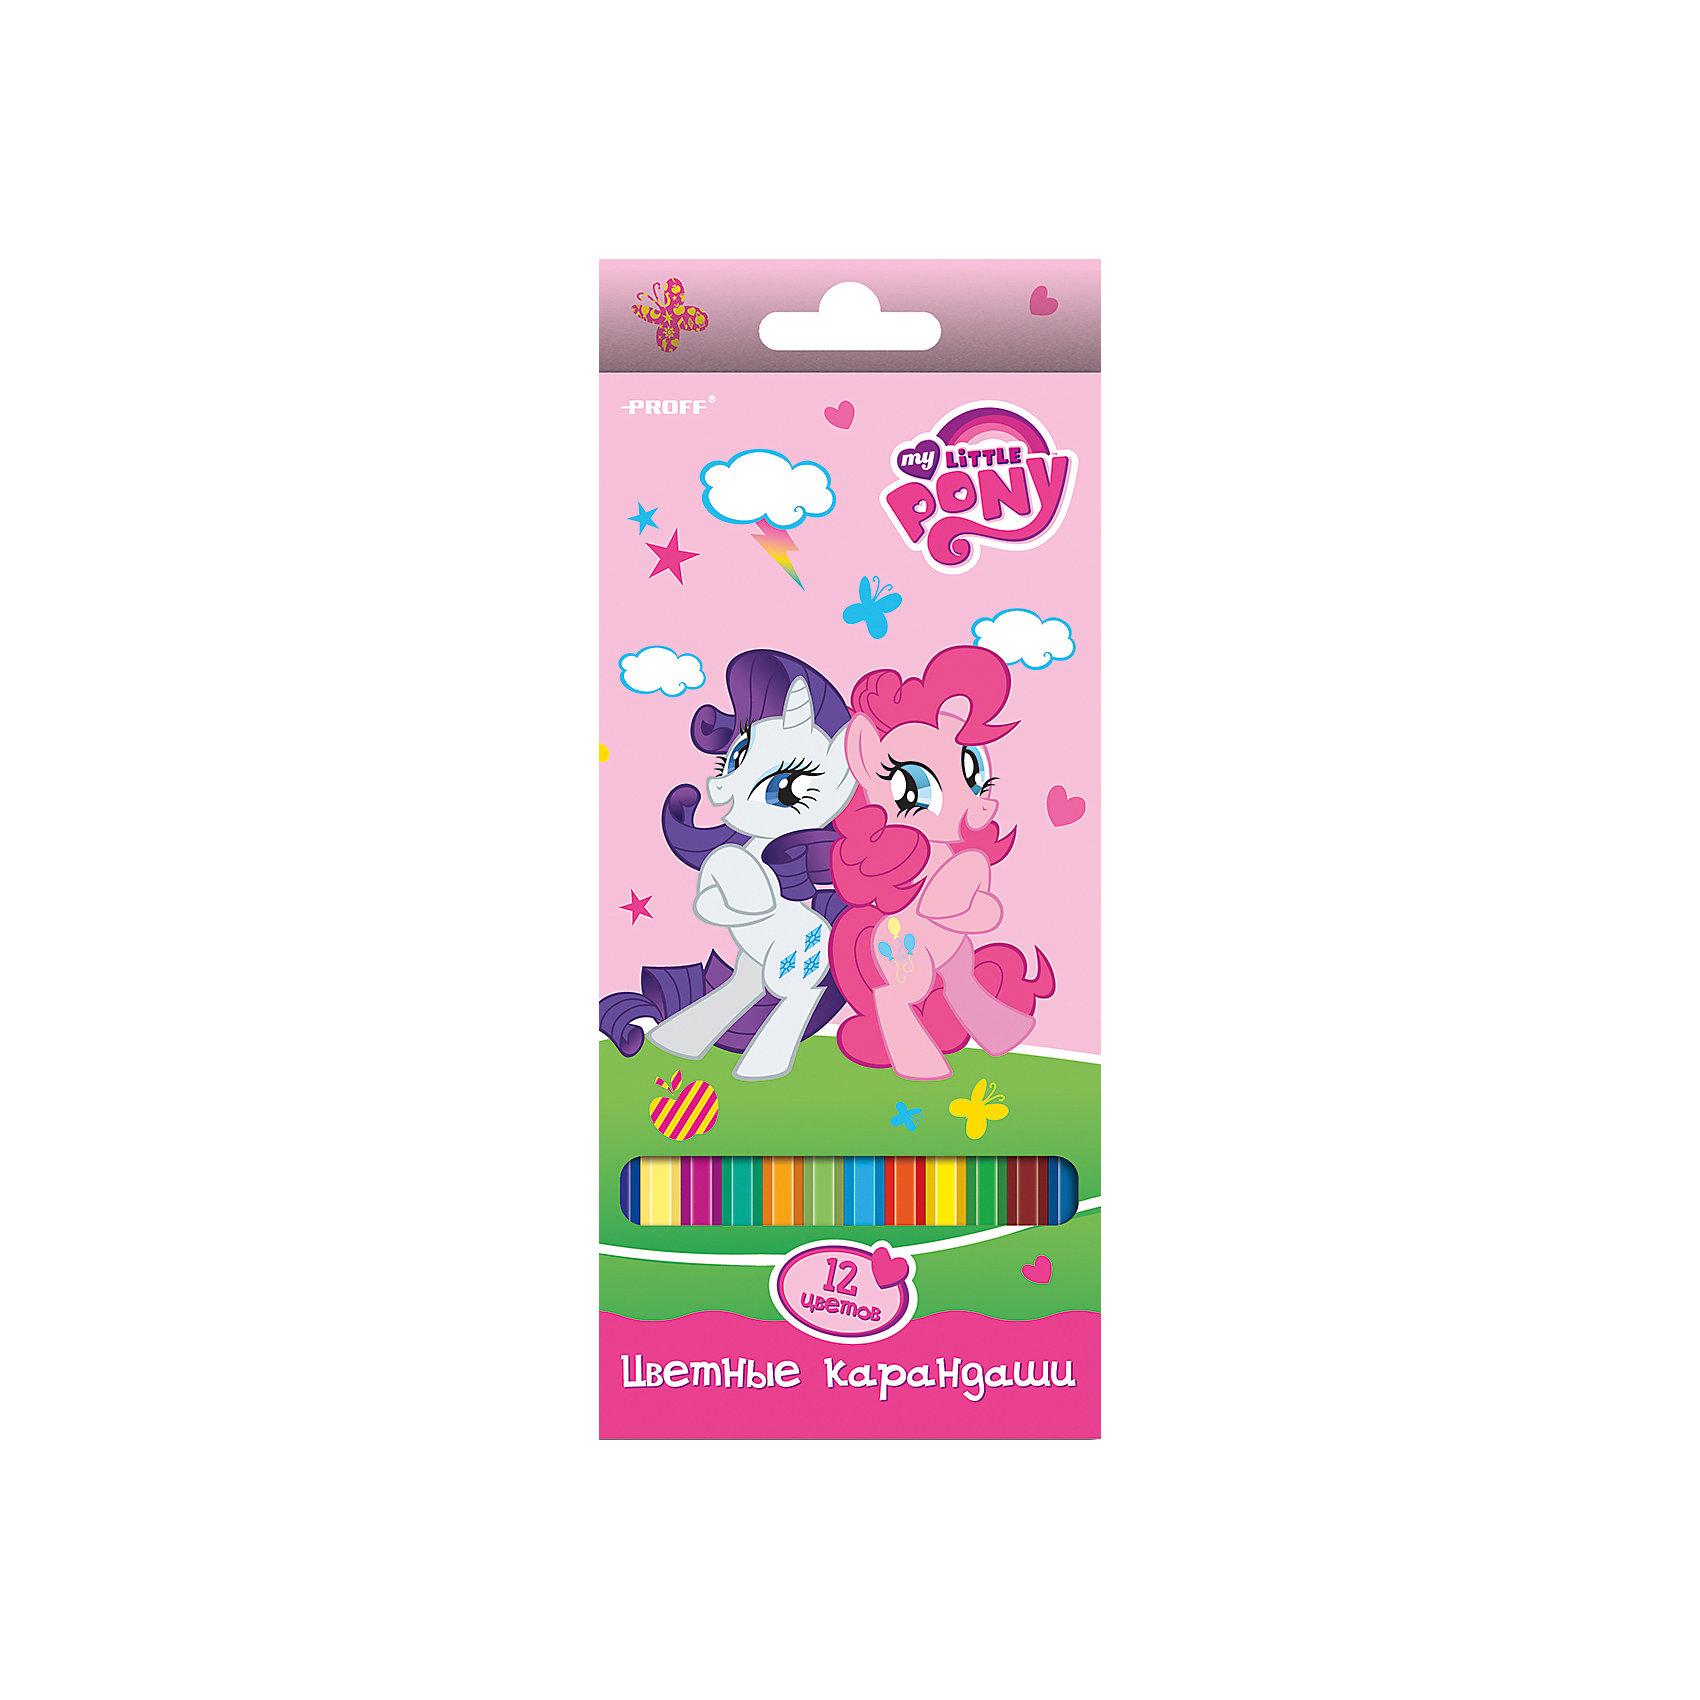 ������� ��������� ��� ��������� ���� 12 ������������� ��������� My Little Pony (��� ���� ����) �������� ������ ������� � �� ������� �������� �������, ������� ��� ����� ����� ��������, ������������ � ������. � ������� ���� ���������� ���� ��������� ����� ��������� ��������� ���� ��������� ������������ ���������, �������� �����������, ������ ��������, ����������� ��������, ��������������� � �����������. ��� ����������� �� ������������������ ���������, ����� ������� �������, ������� �� ��������� ��� ������� � �� ����������� ������ �������, ���� ������ �������� ������ �������� �� ���. ��������� ����� ������������ � ��������� ��� ������������� �� ����������.<br><br>�������������� ����������:<br><br>- ��������: ������.<br>- ������ ��������: 21�12�1 ��<br>- 12 ������.<br><br>������� ��������� ��� ��������� ���� 12 ������, ����� ������ � ����� ��������.<br><br>������ ��: 180<br>������� ��: 10<br>������ ��: 85<br>��� �: 70<br>������� �� �������: 36<br>������� �� �������: 84<br>���: �������<br>�������: �������<br>SKU: 4123538